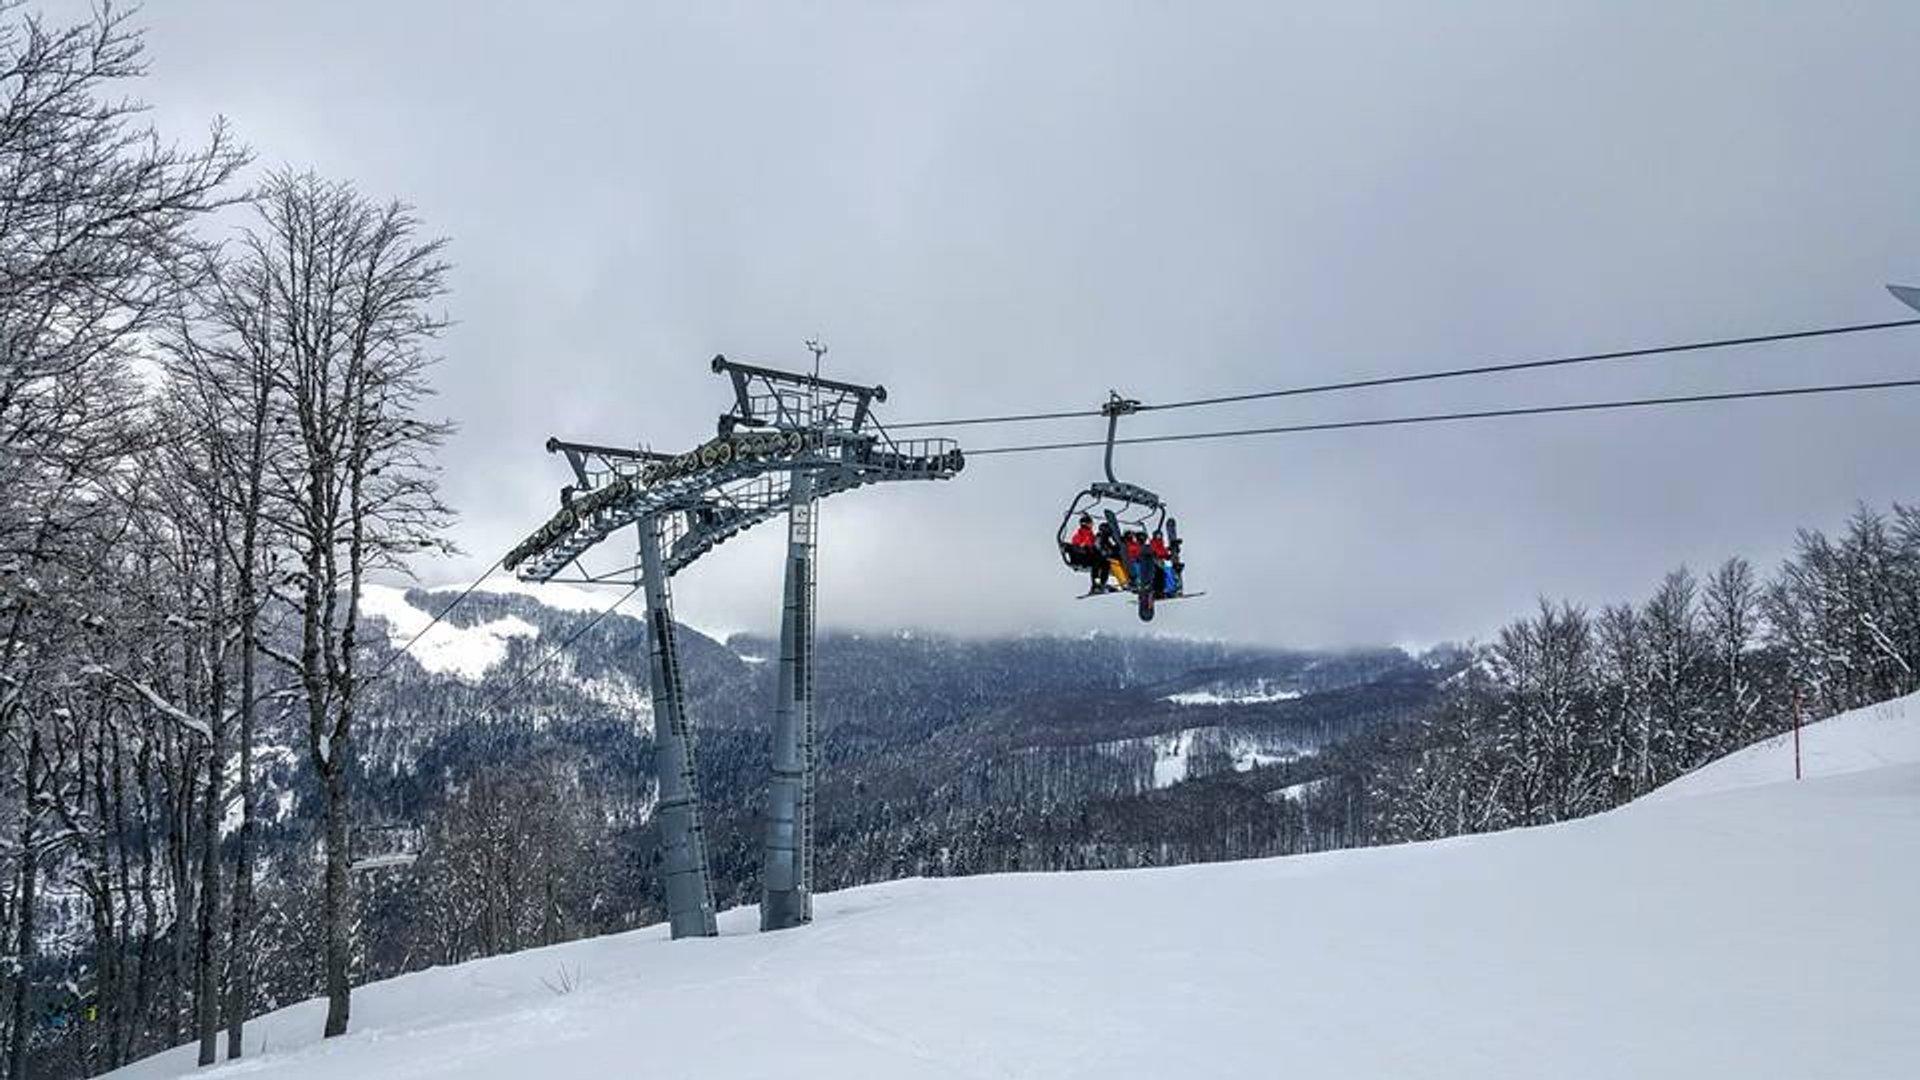 Skiing and Snowboarding in Montenegro - Best Season 2020